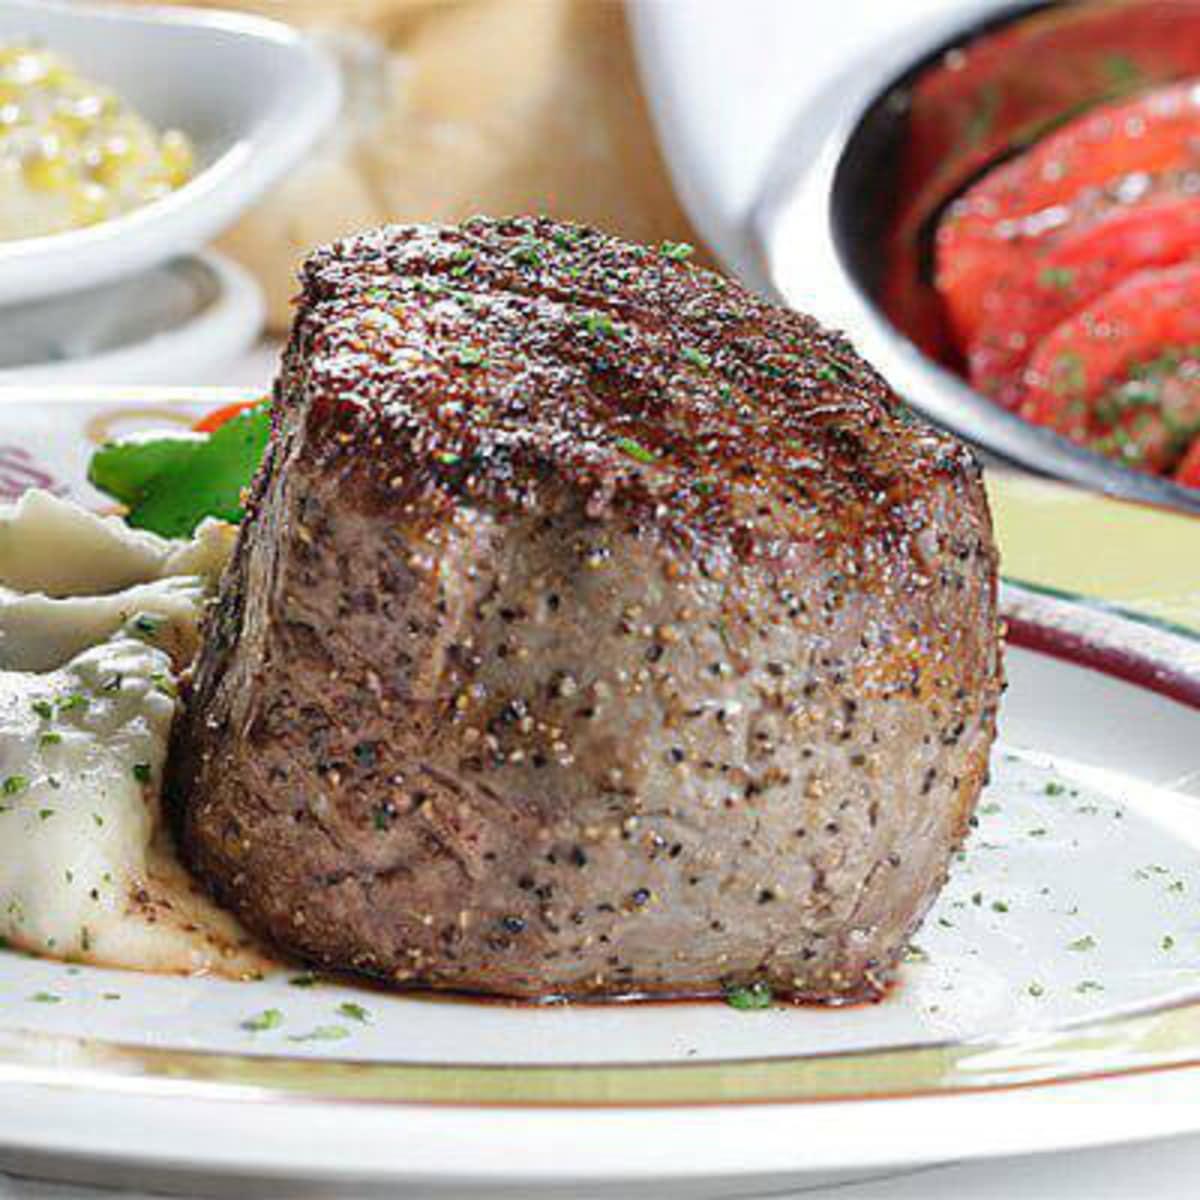 Steak at III Forks restaurant